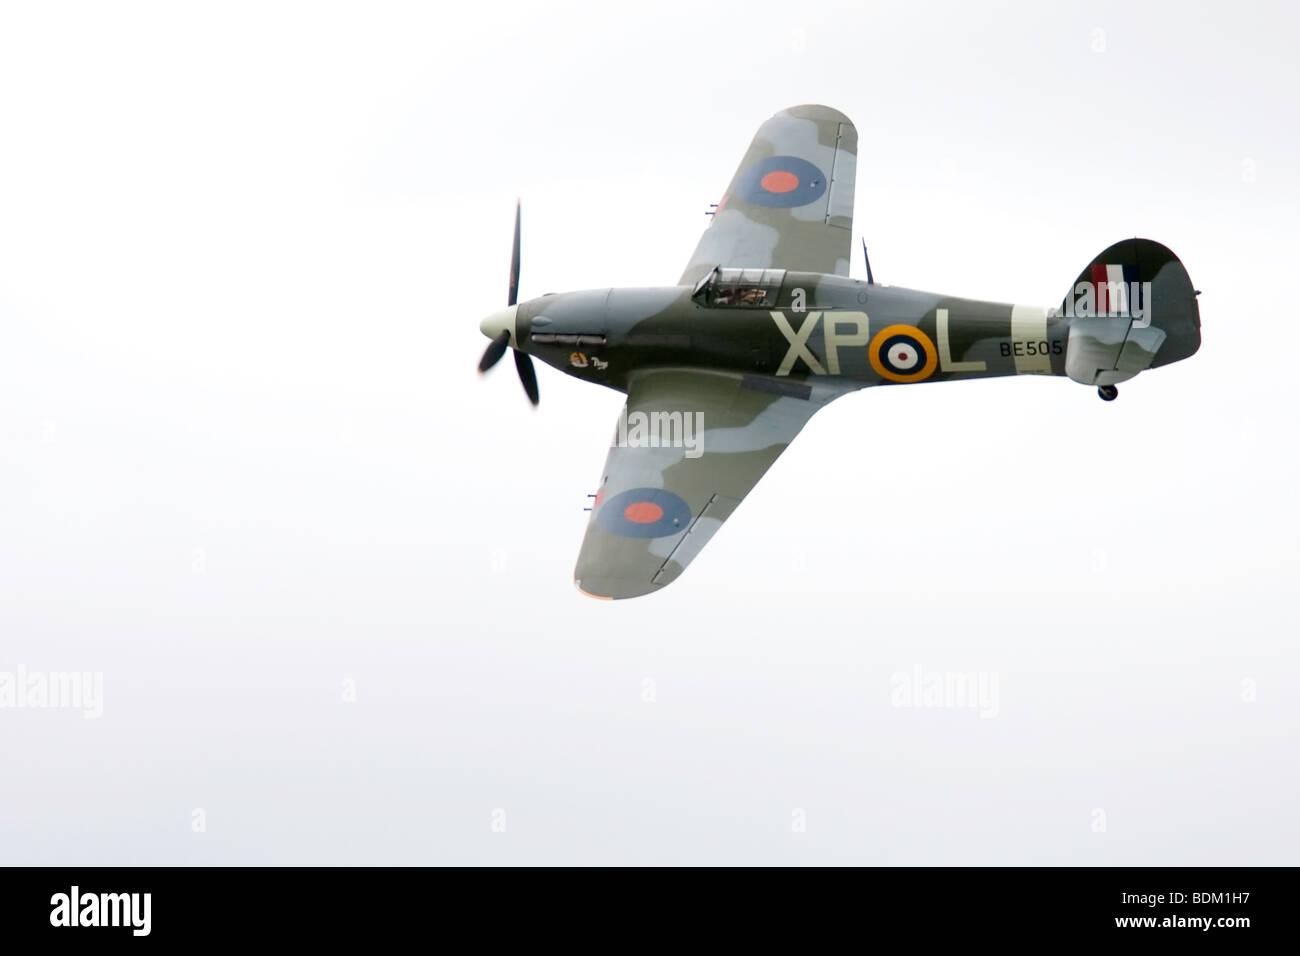 A Restored Hawker Hurricane - Stock Image